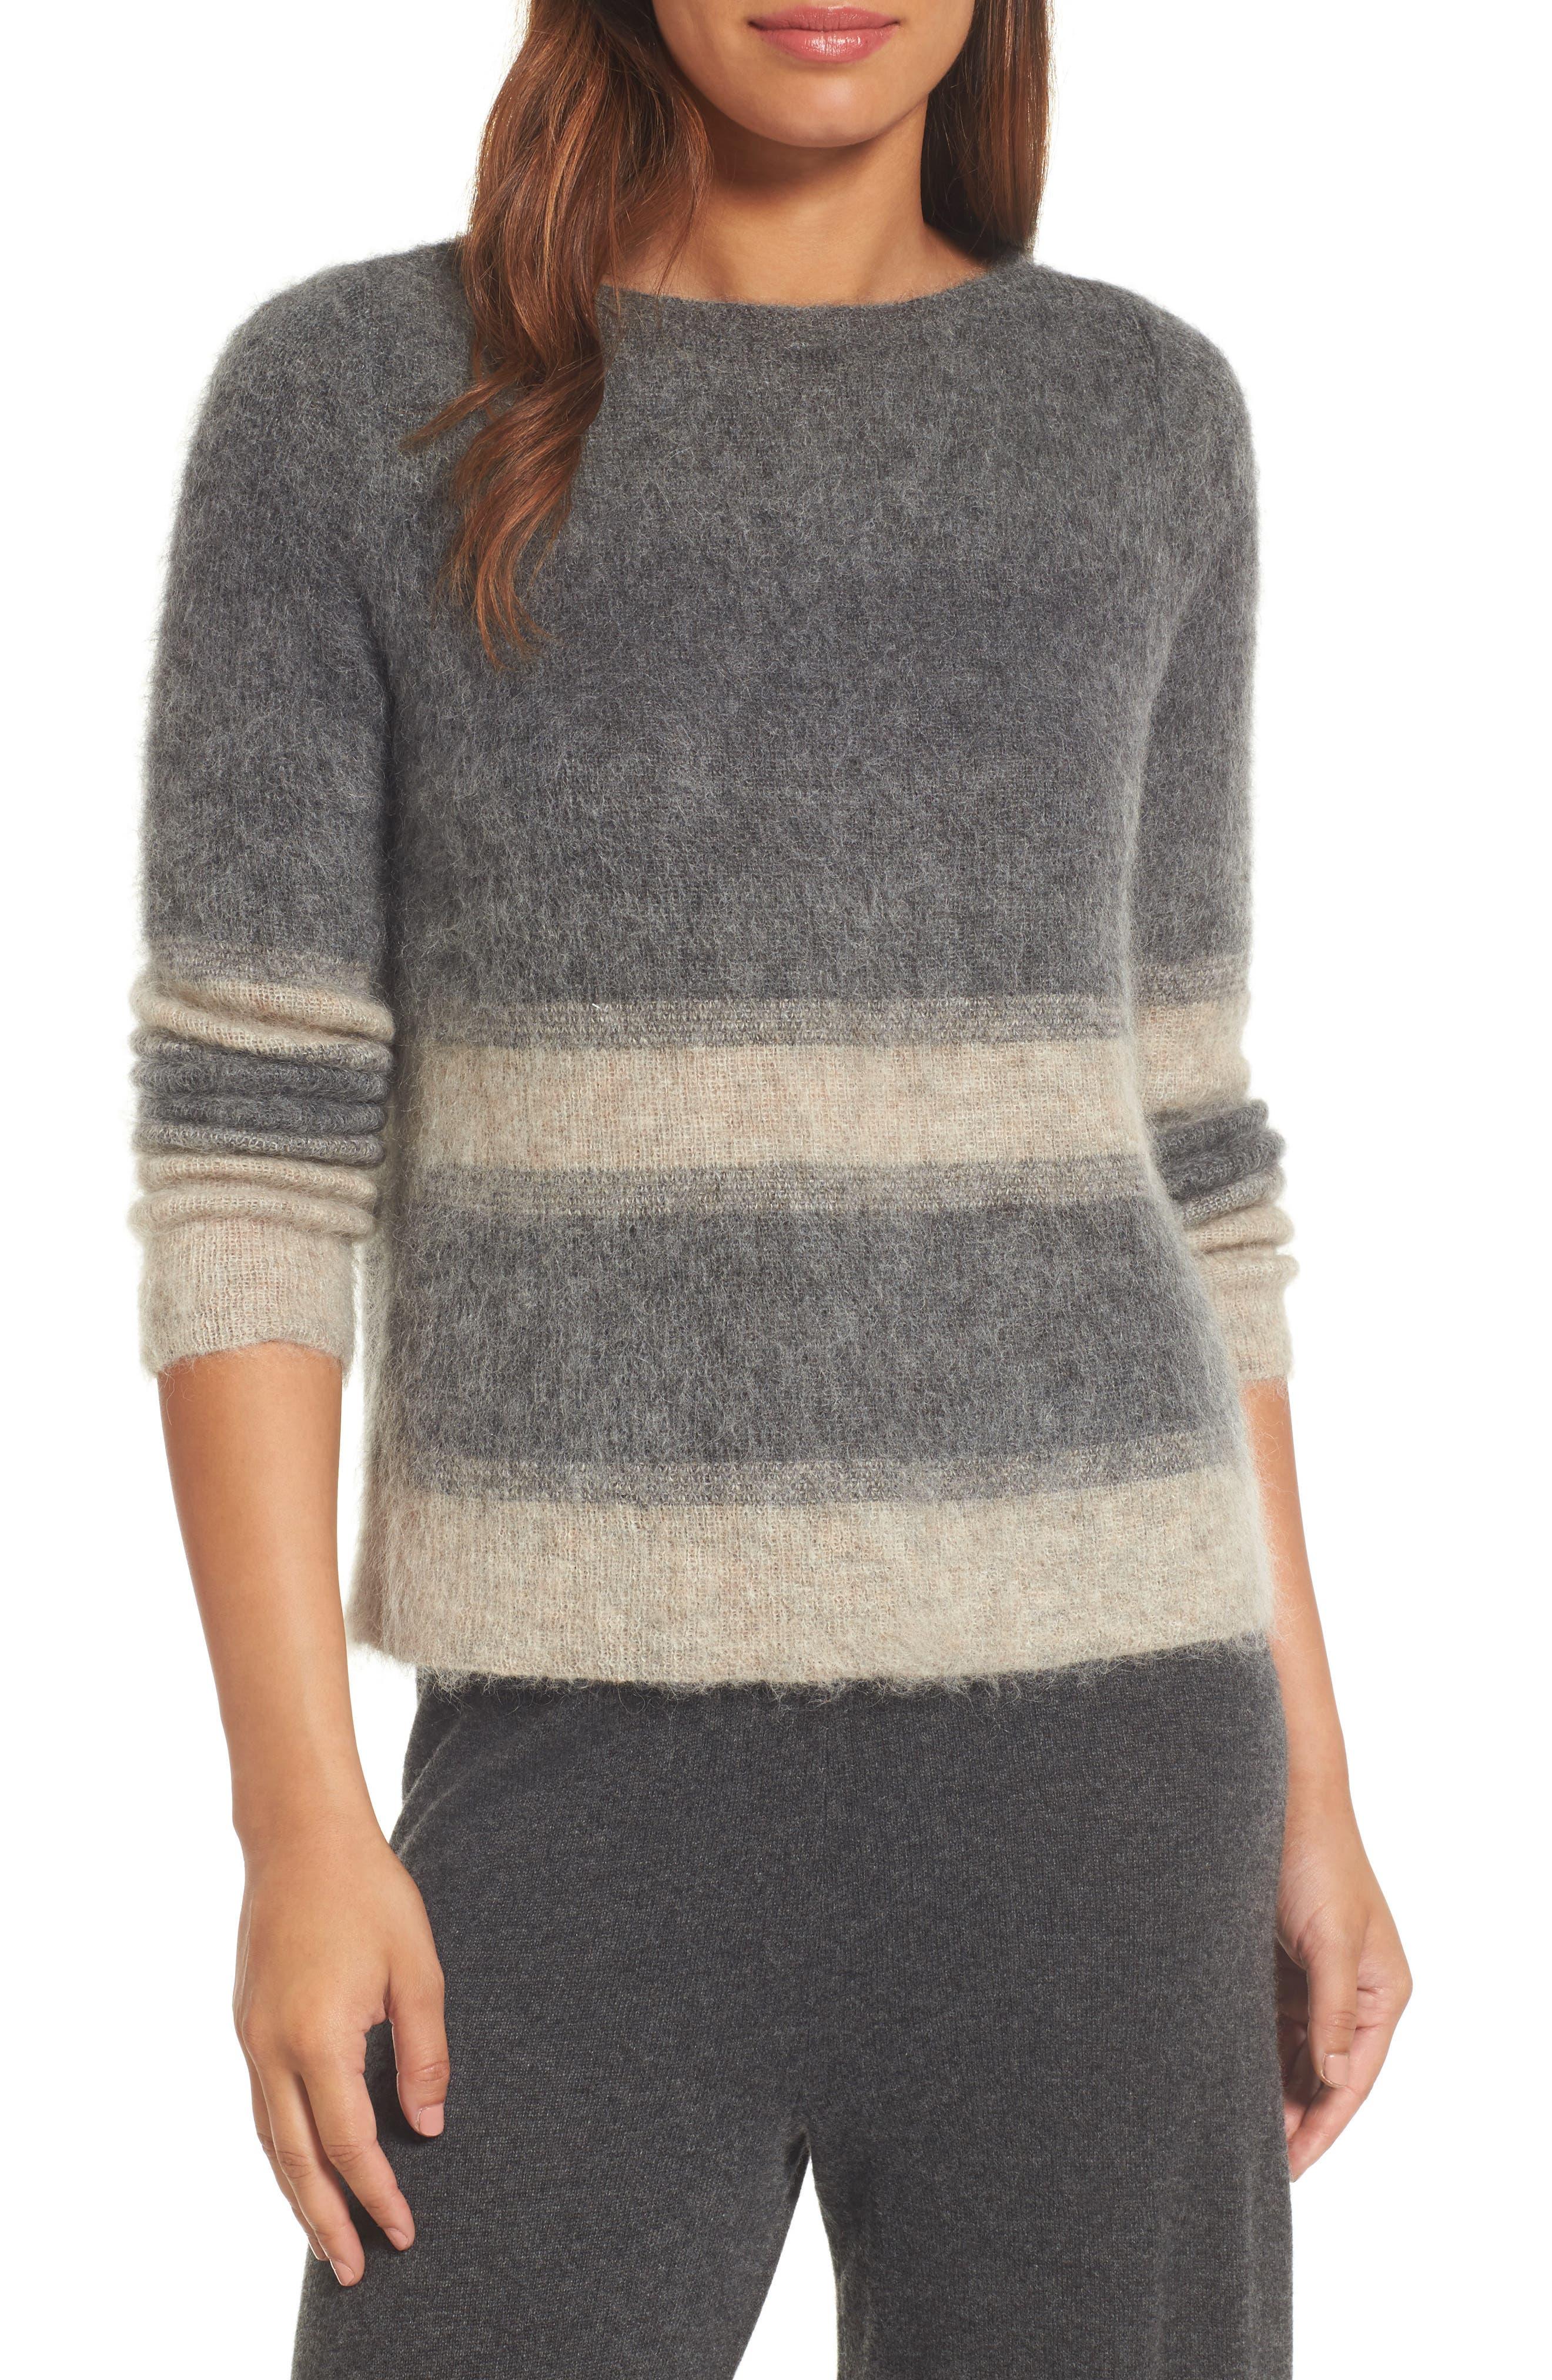 Alternate Image 1 Selected - Eileen Fisher Stripe Mohair & Alpaca Blend Bateau Neck Sweater